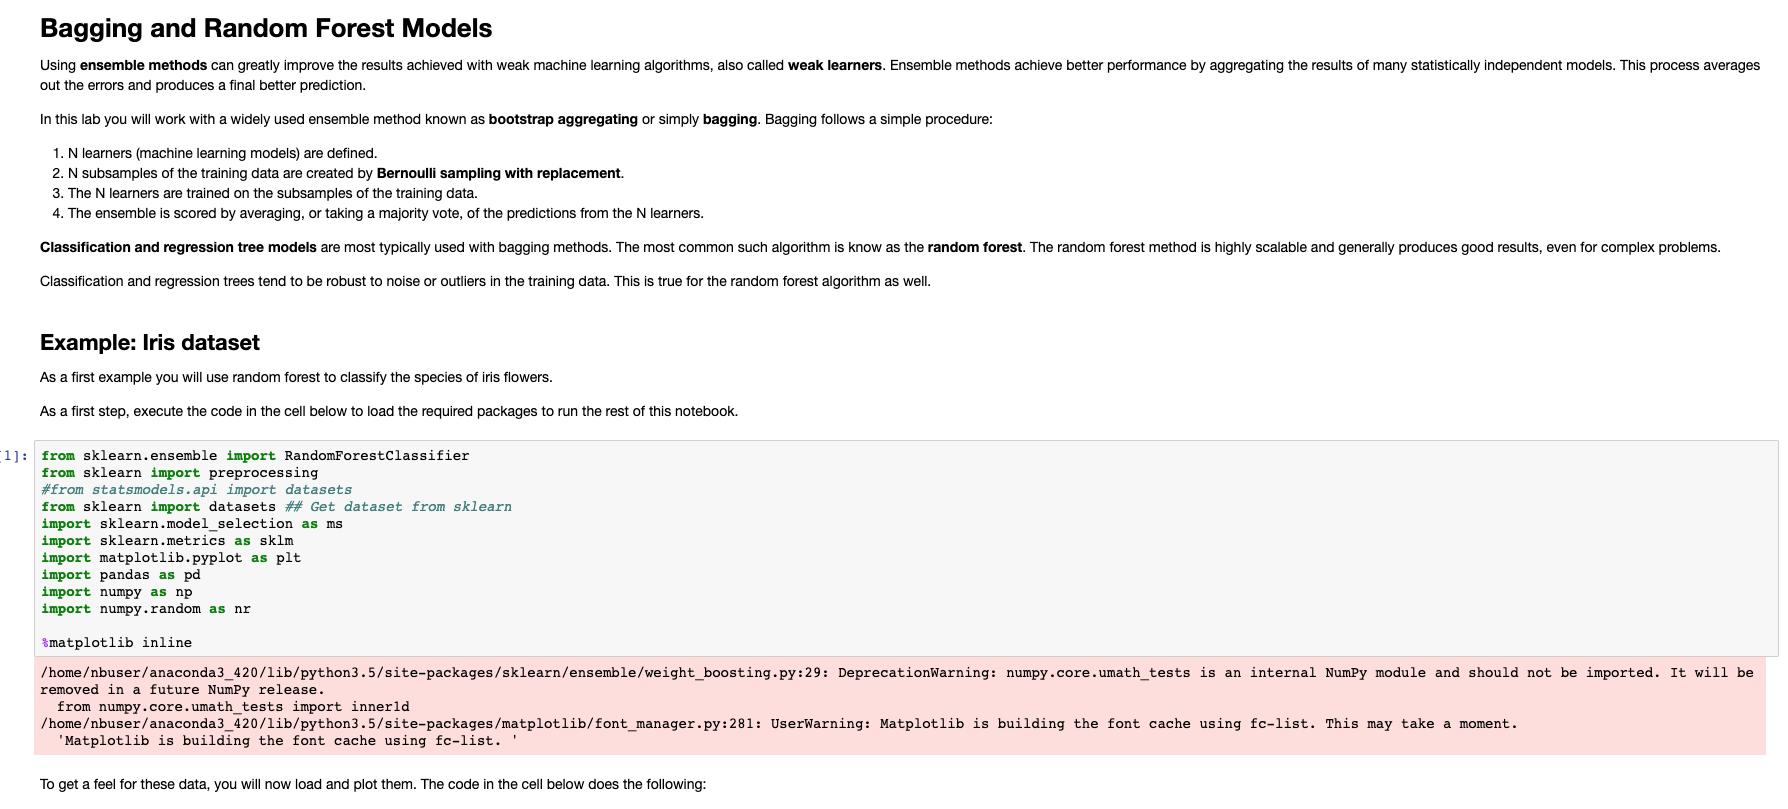 Microsoft: DAT275x Principles of Machine Learning: Python